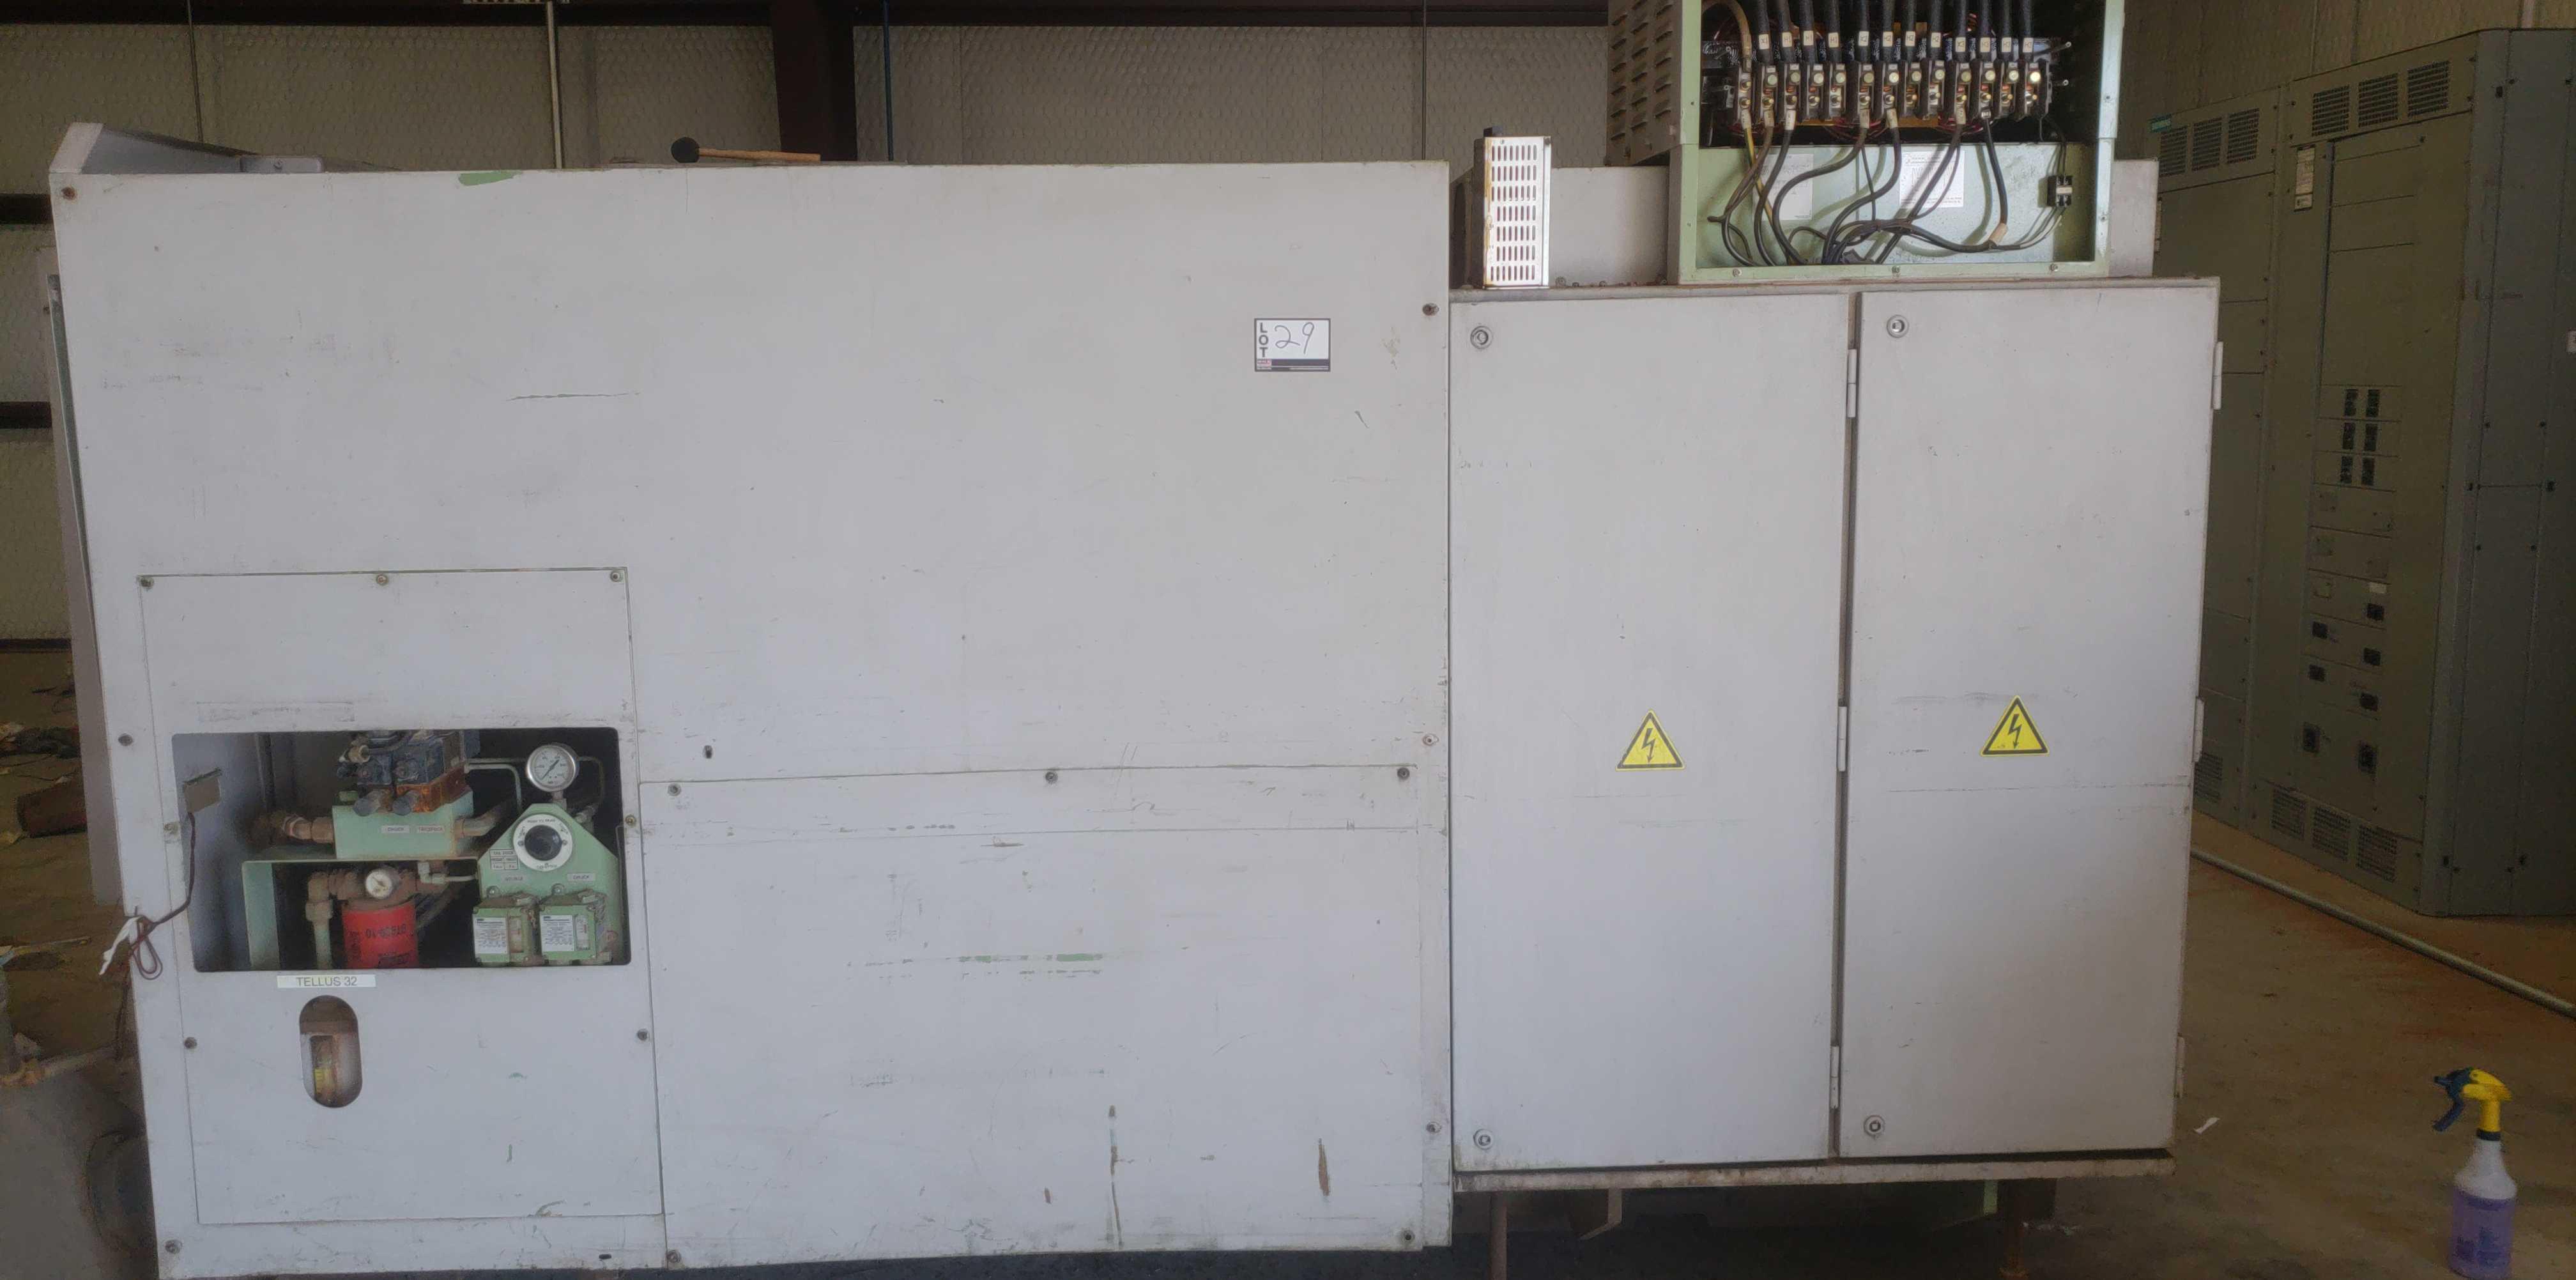 "Okuma LB 25 2 Axis CNC lathe, 5020 control, chip conveyor, 10"" chuck SN: 06119625 - Image 4 of 7"